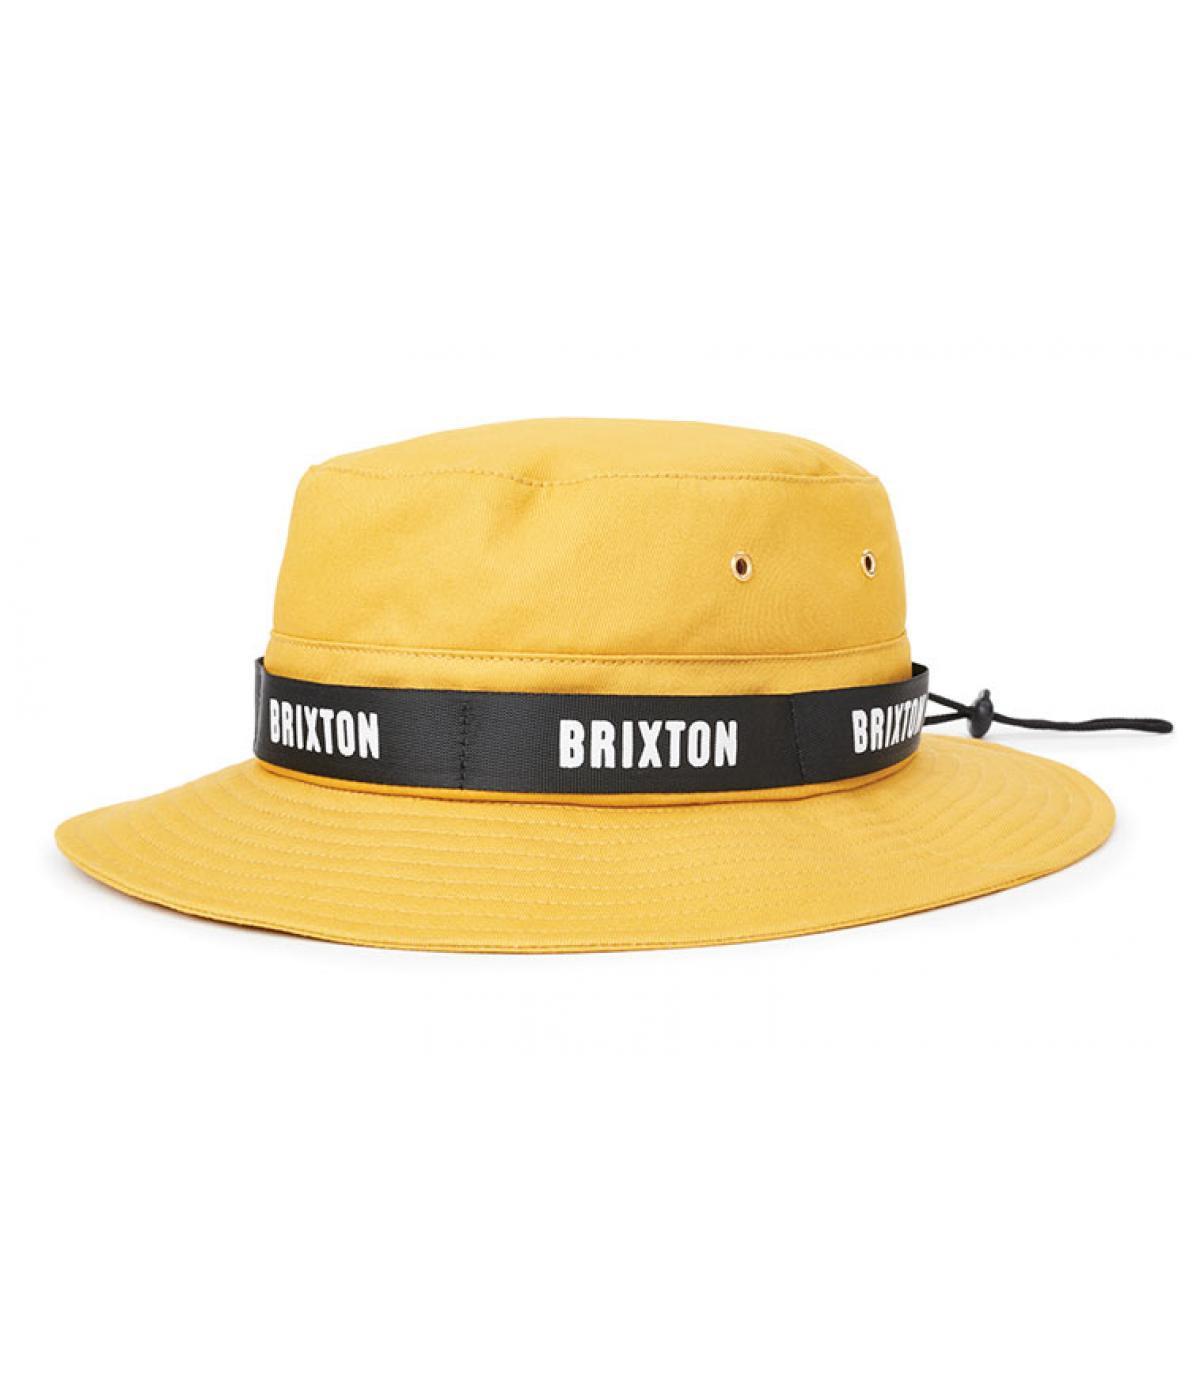 c009f98a3f475 beige bucket hat Brixton - Ration II Bucket topaz by Brixton. Headict